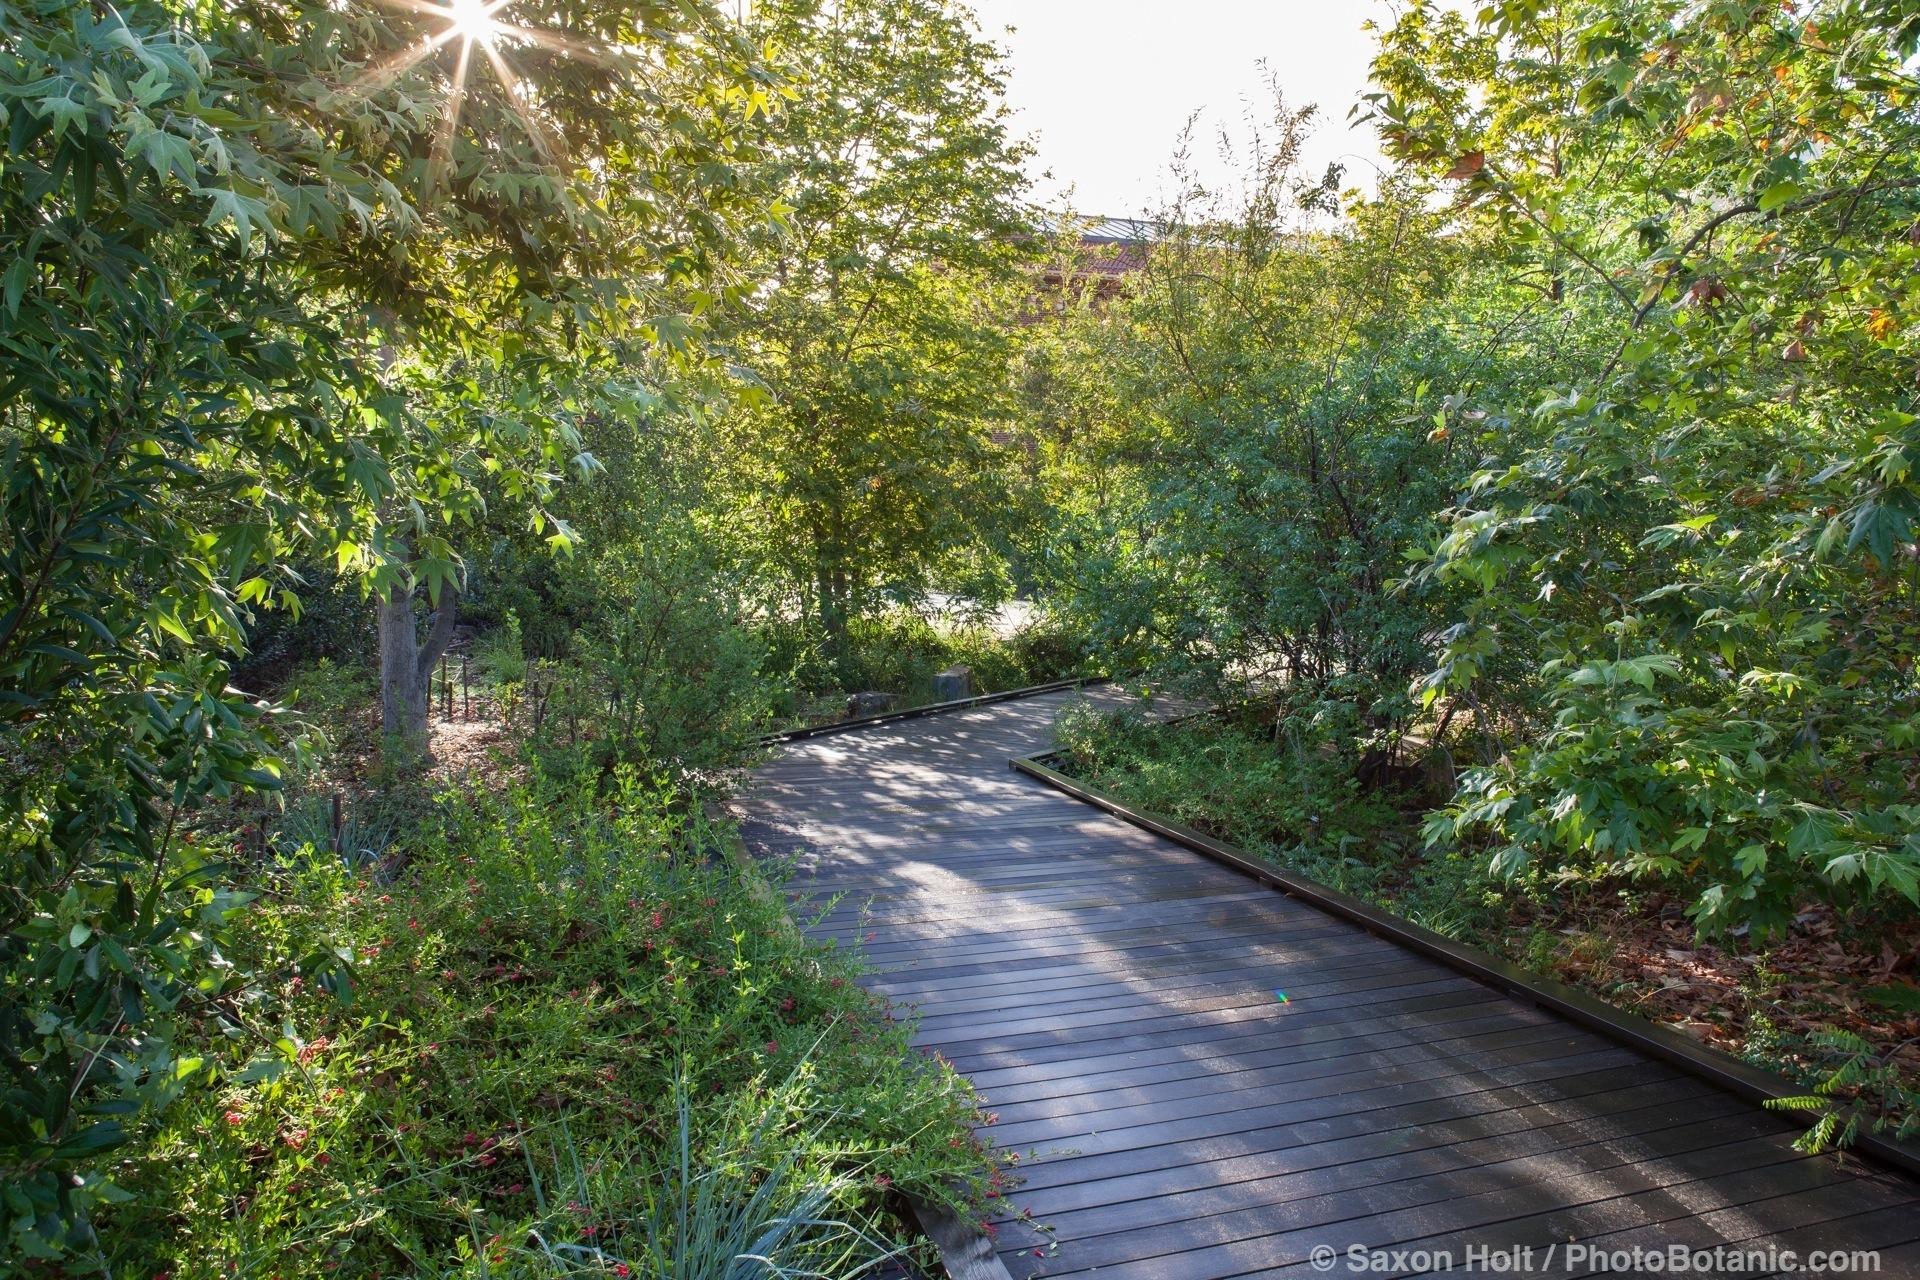 Boardwalk path through habitat garden, the Natural History Museum of Los Angeles.